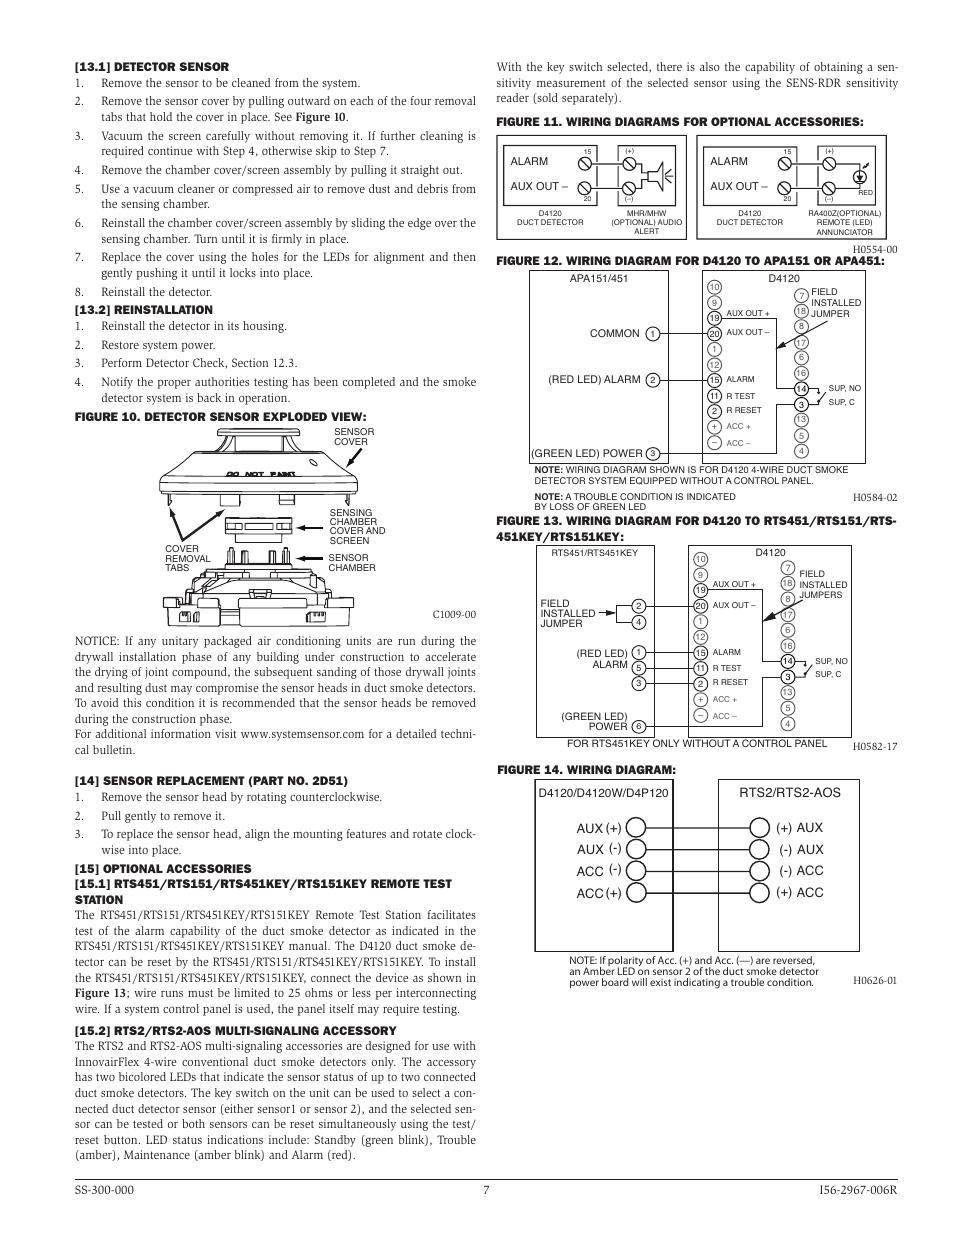 Wiring Diagram  30 System Sensor Duct Detector Wiring Diagram